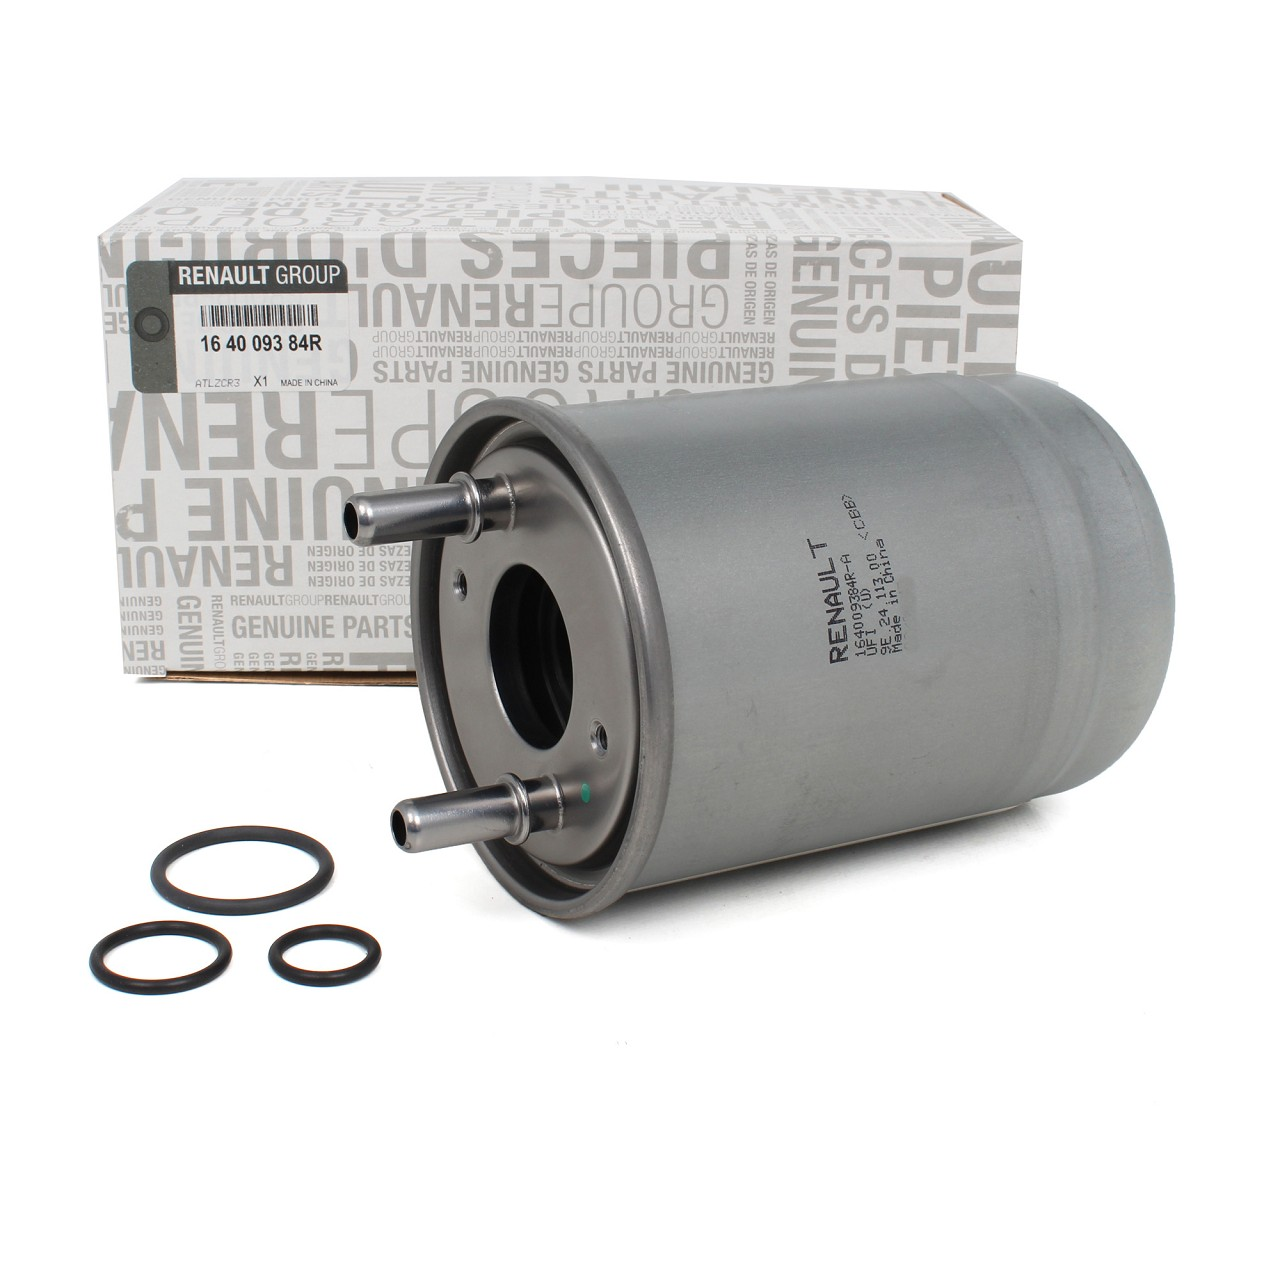 ORIGINAL Renault Kraftstofffilter Dieselfilter Fluence Megane Scenic 164009384R